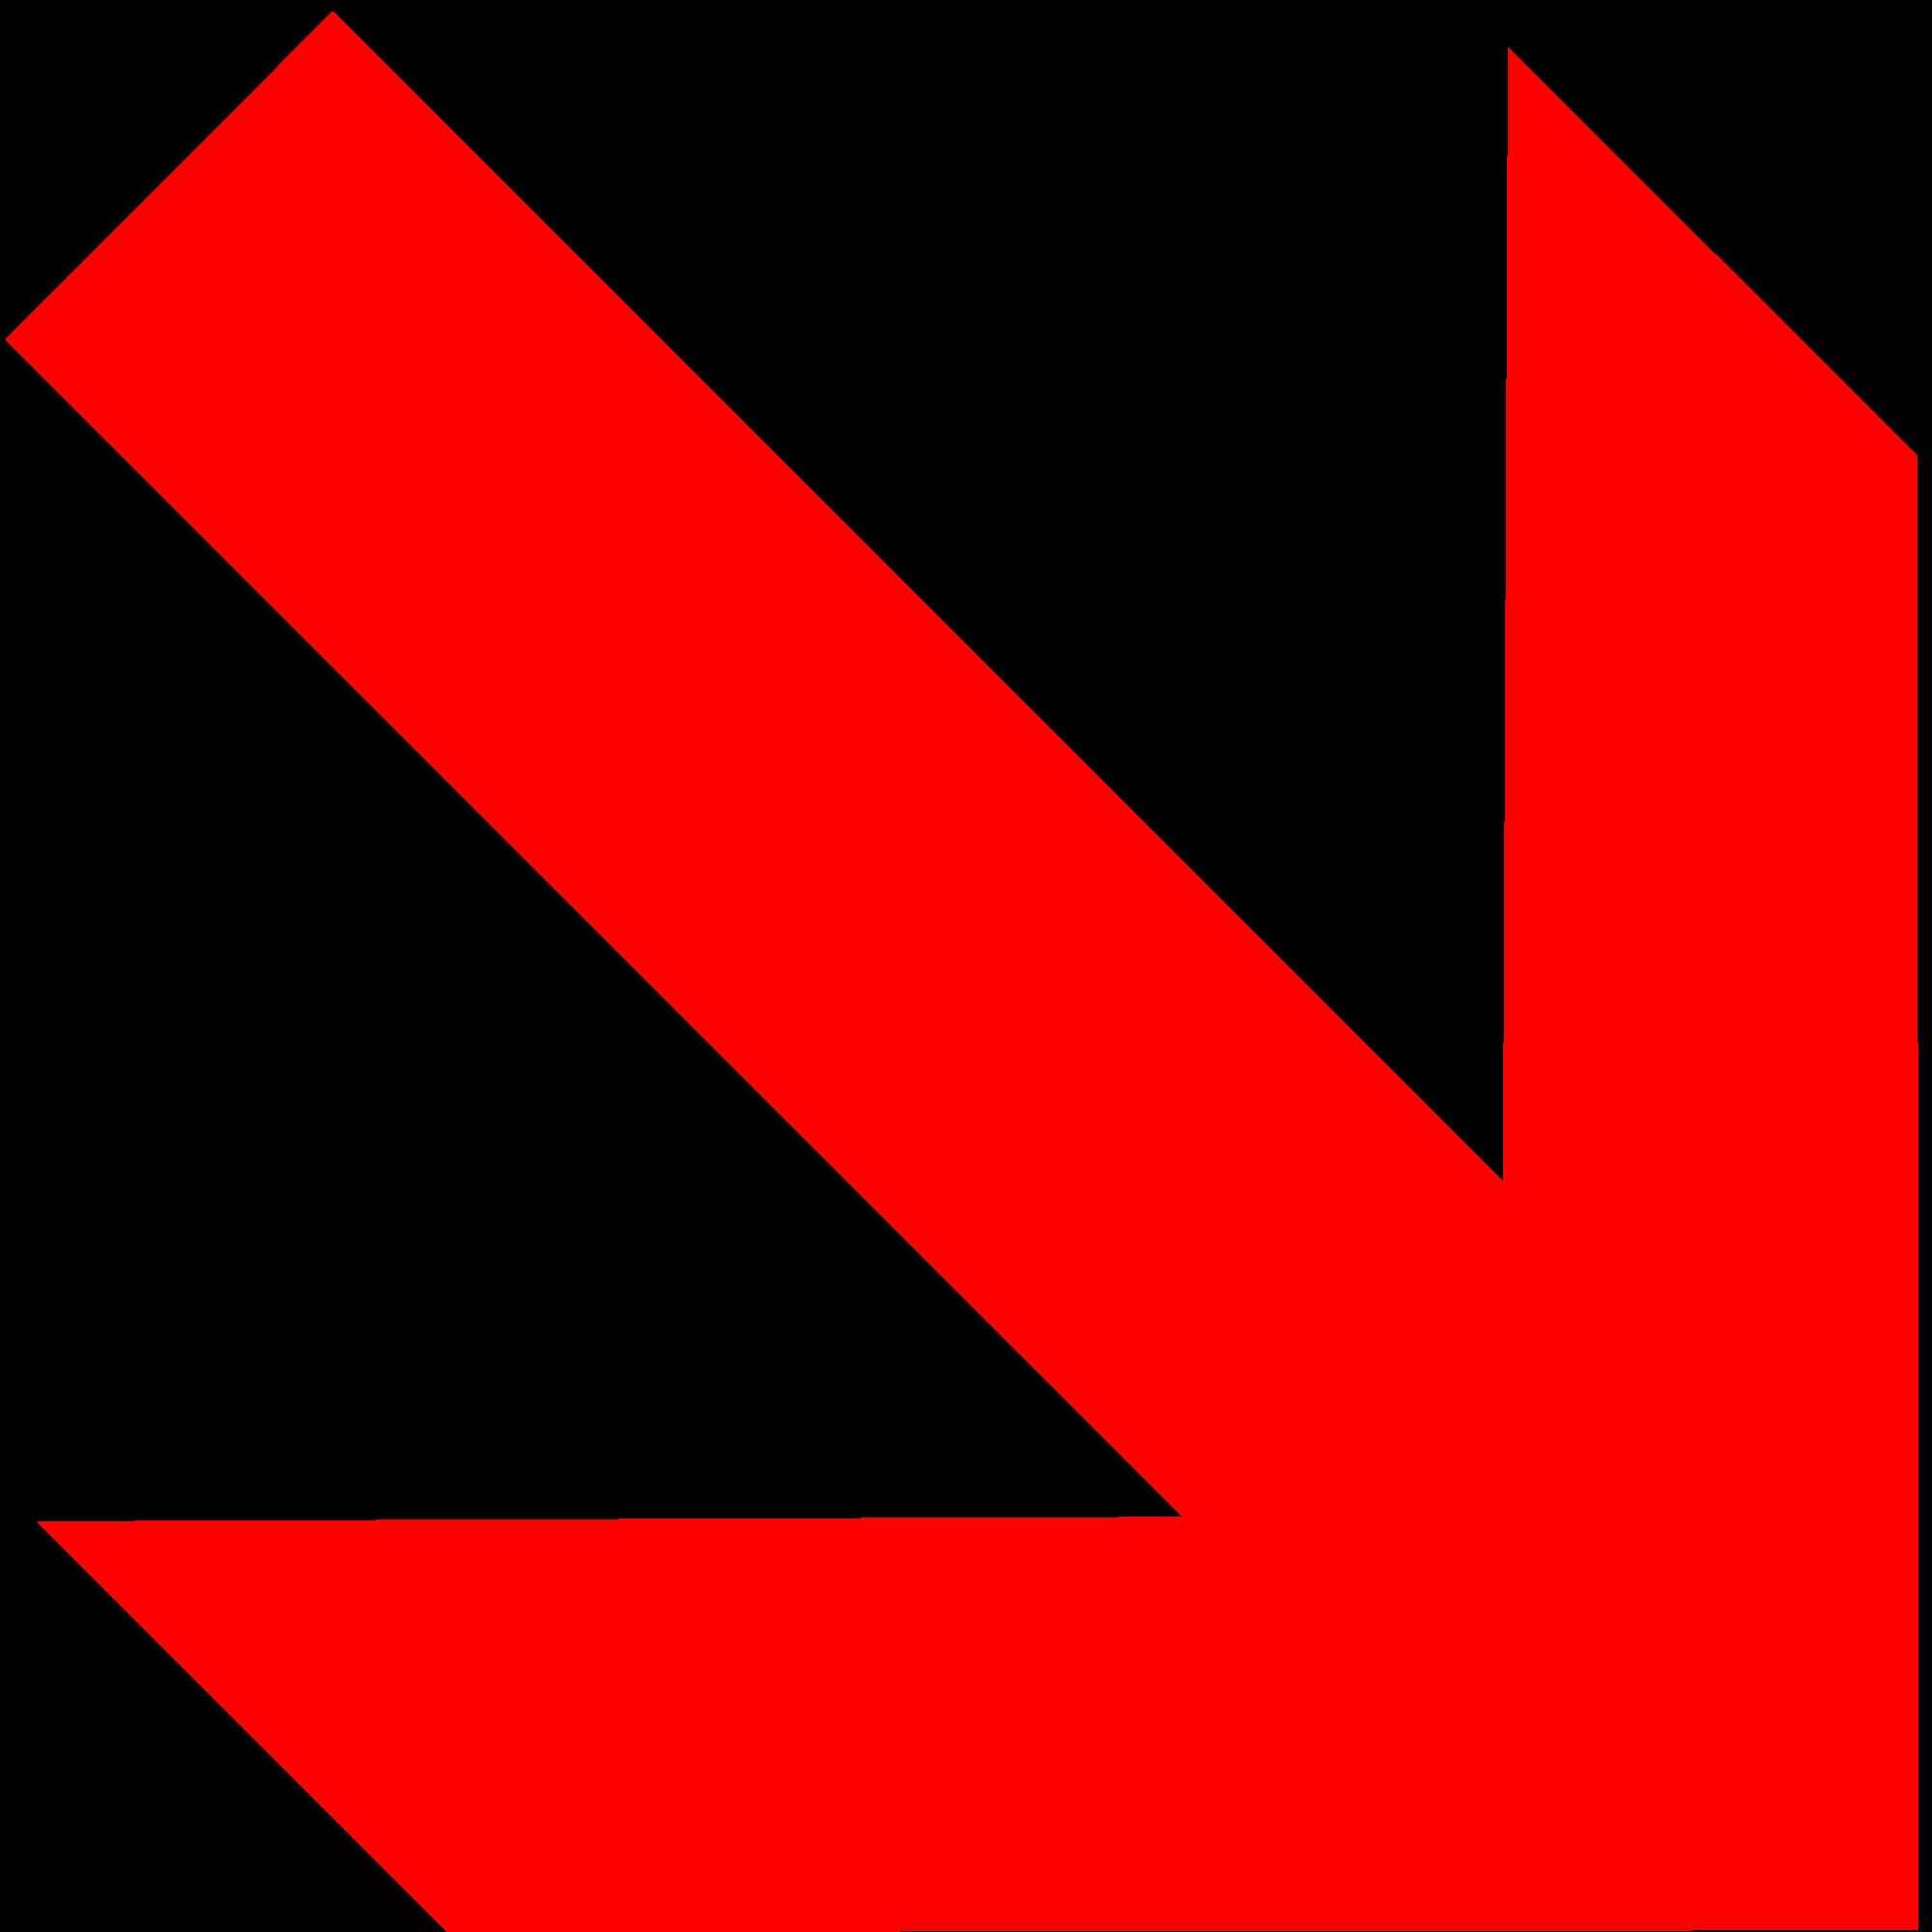 Pfeil nach links,arrow. PNG